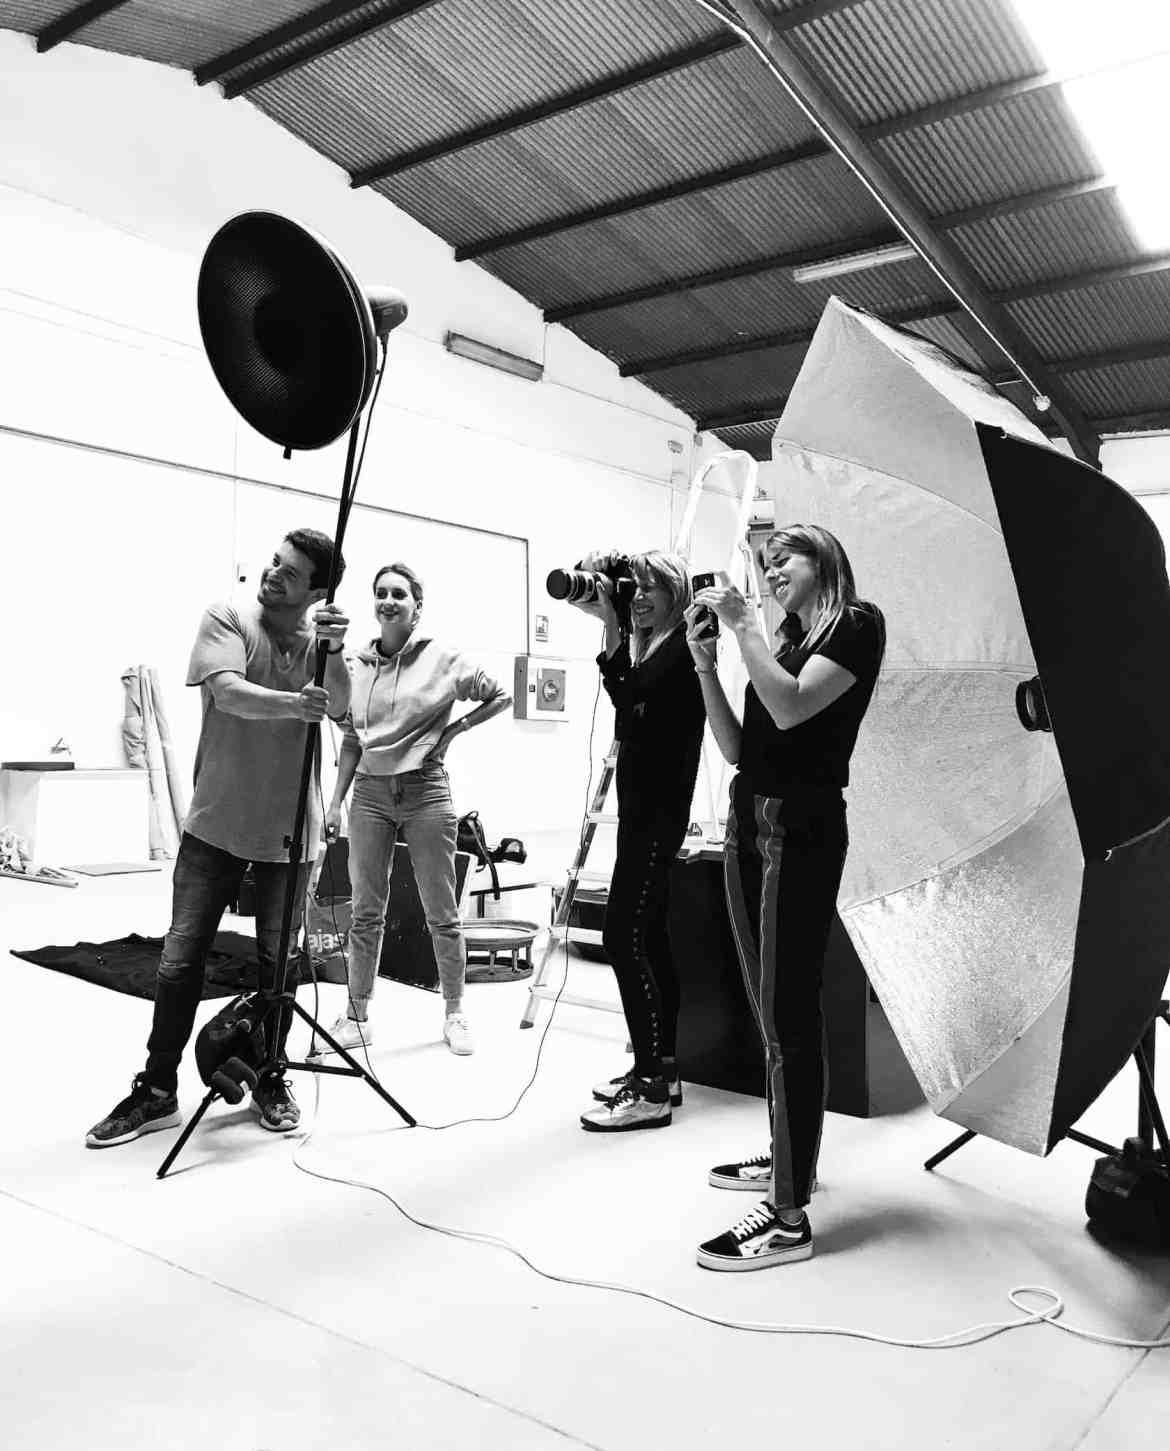 Marbella photography visual storytelling for Social media